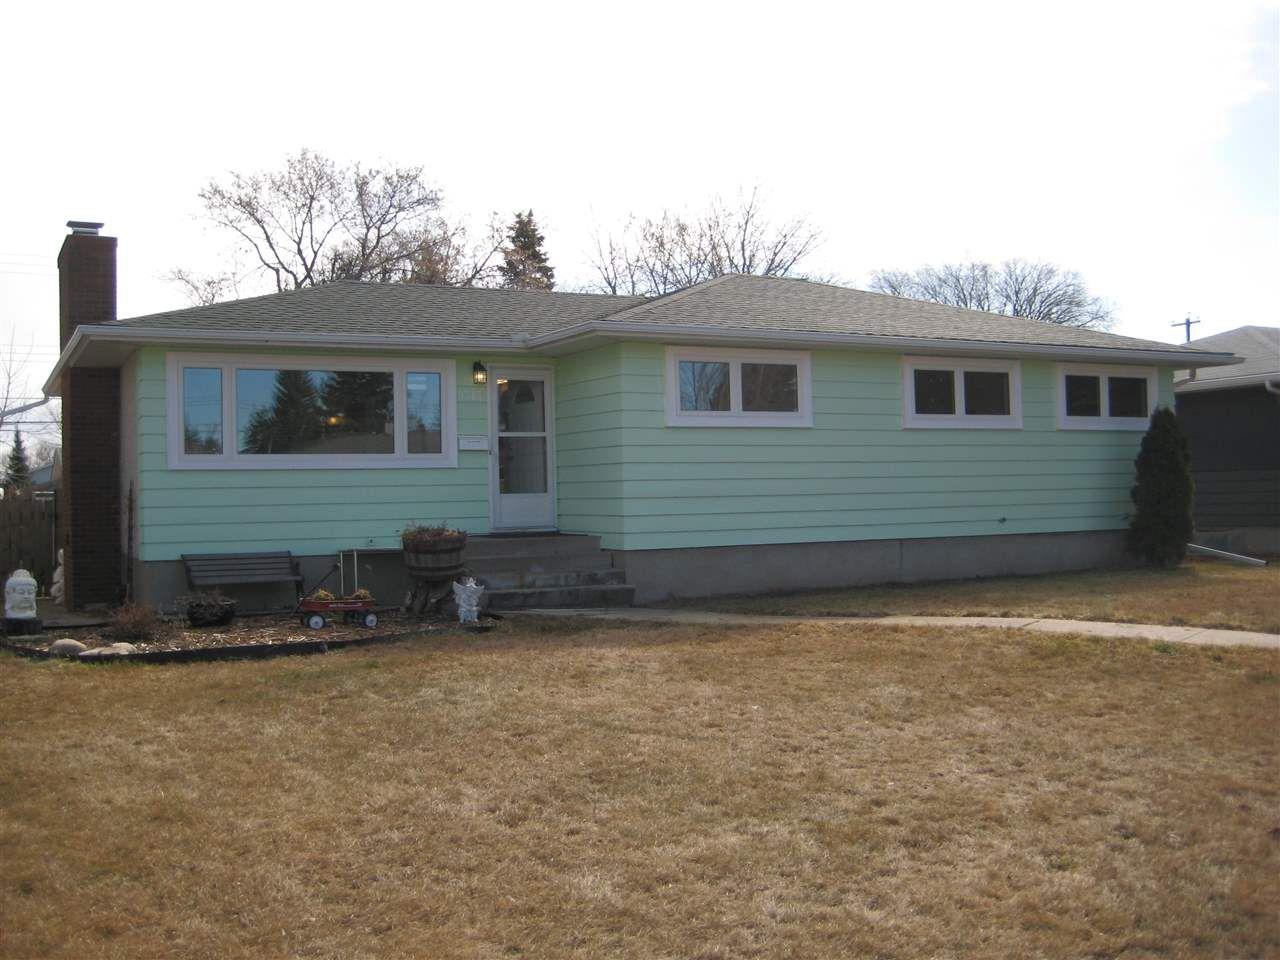 Main Photo: 9313 157 Street in Edmonton: Zone 22 House for sale : MLS®# E4150338